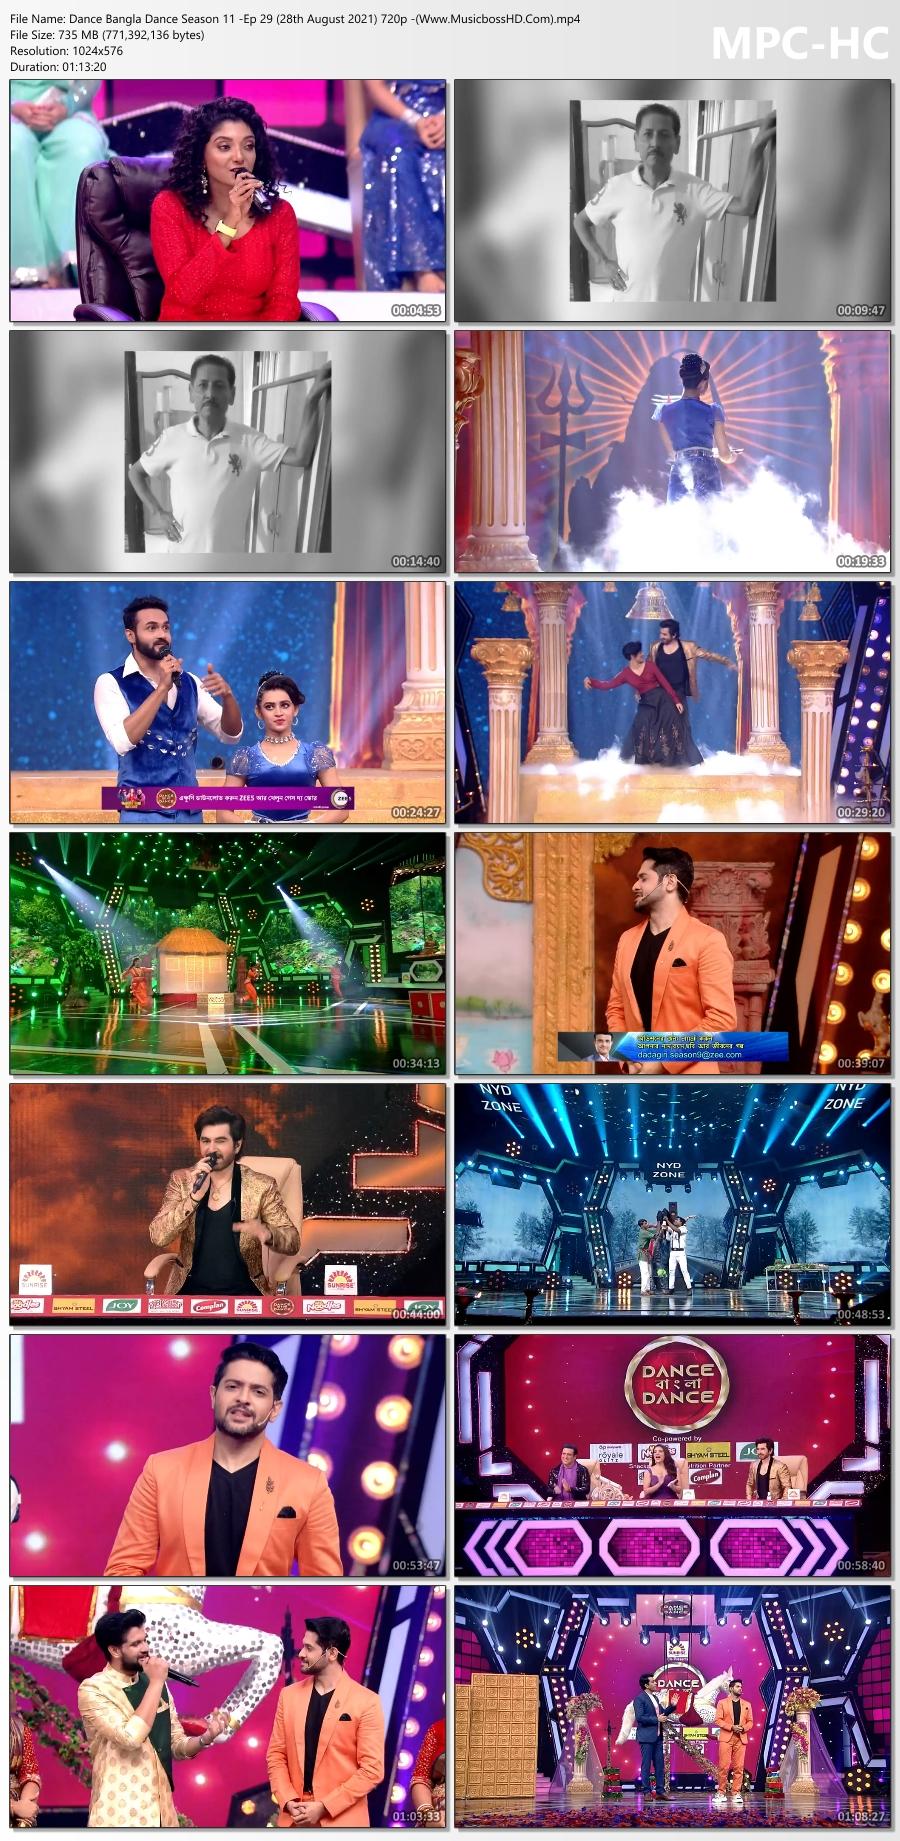 Dance-Bangla-Dance-Season-11-Ep-29-28th-August-2021-720p-Www-Musicboss-HD-Com-mp4-thumbs